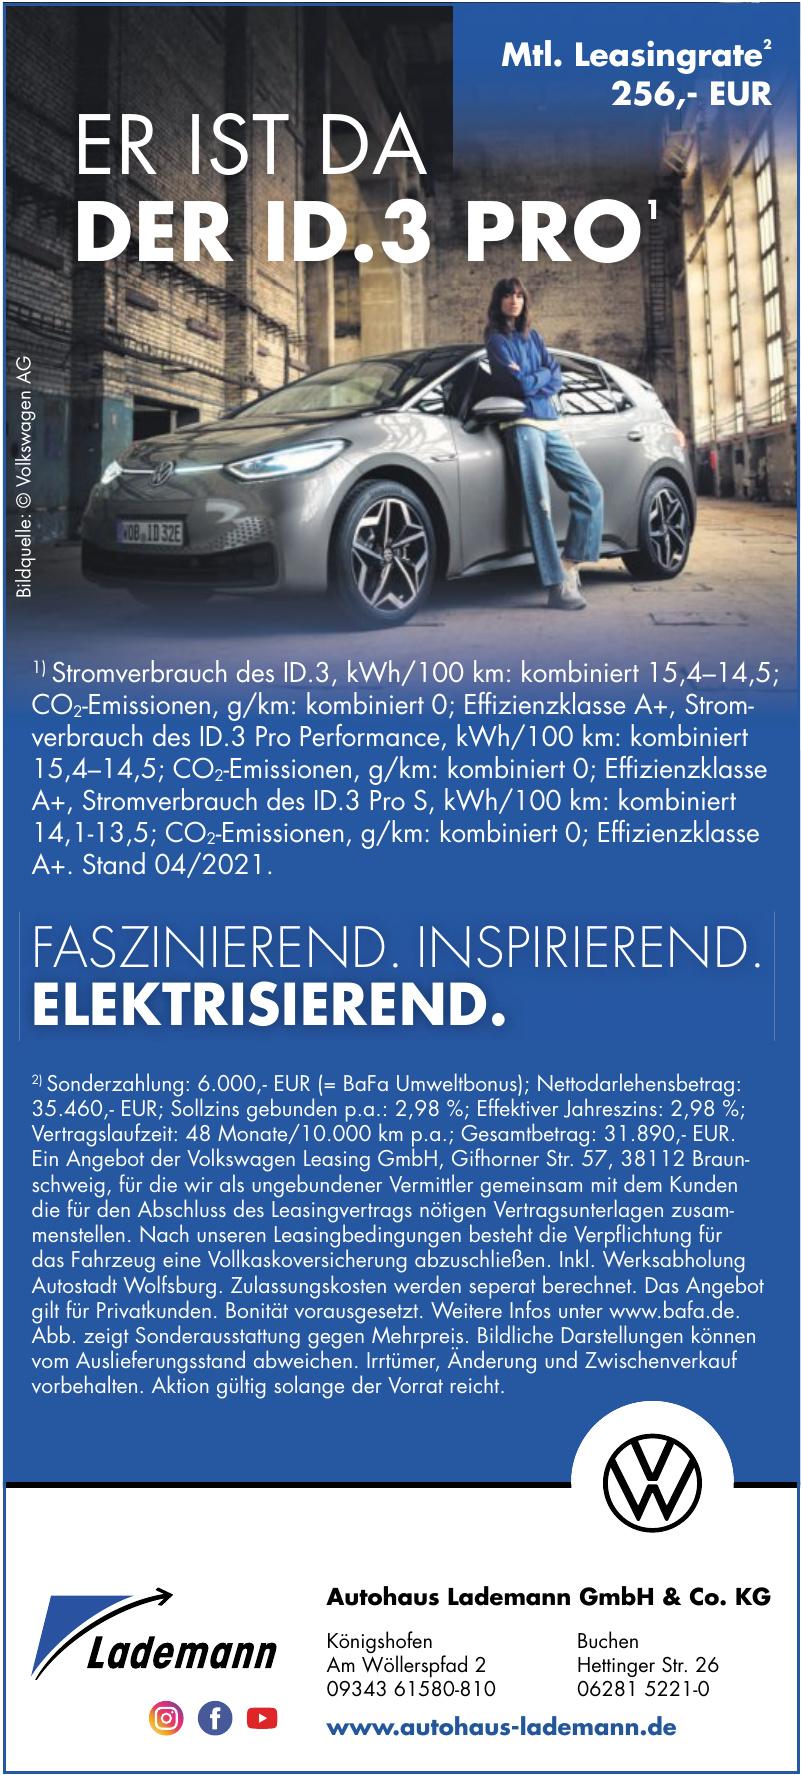 Autohaus Lademann GmbH & Co. KG